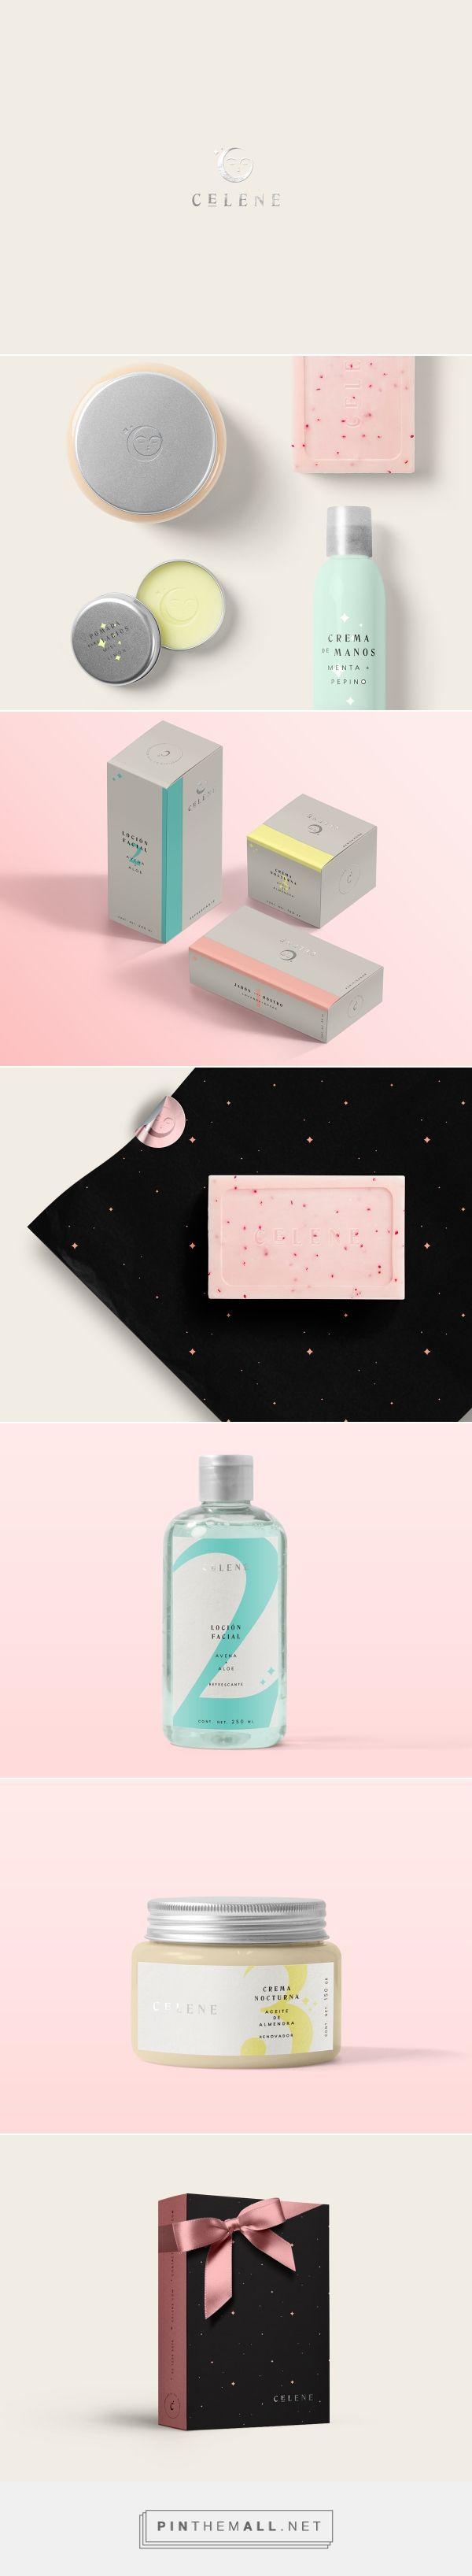 Célene packaging branding